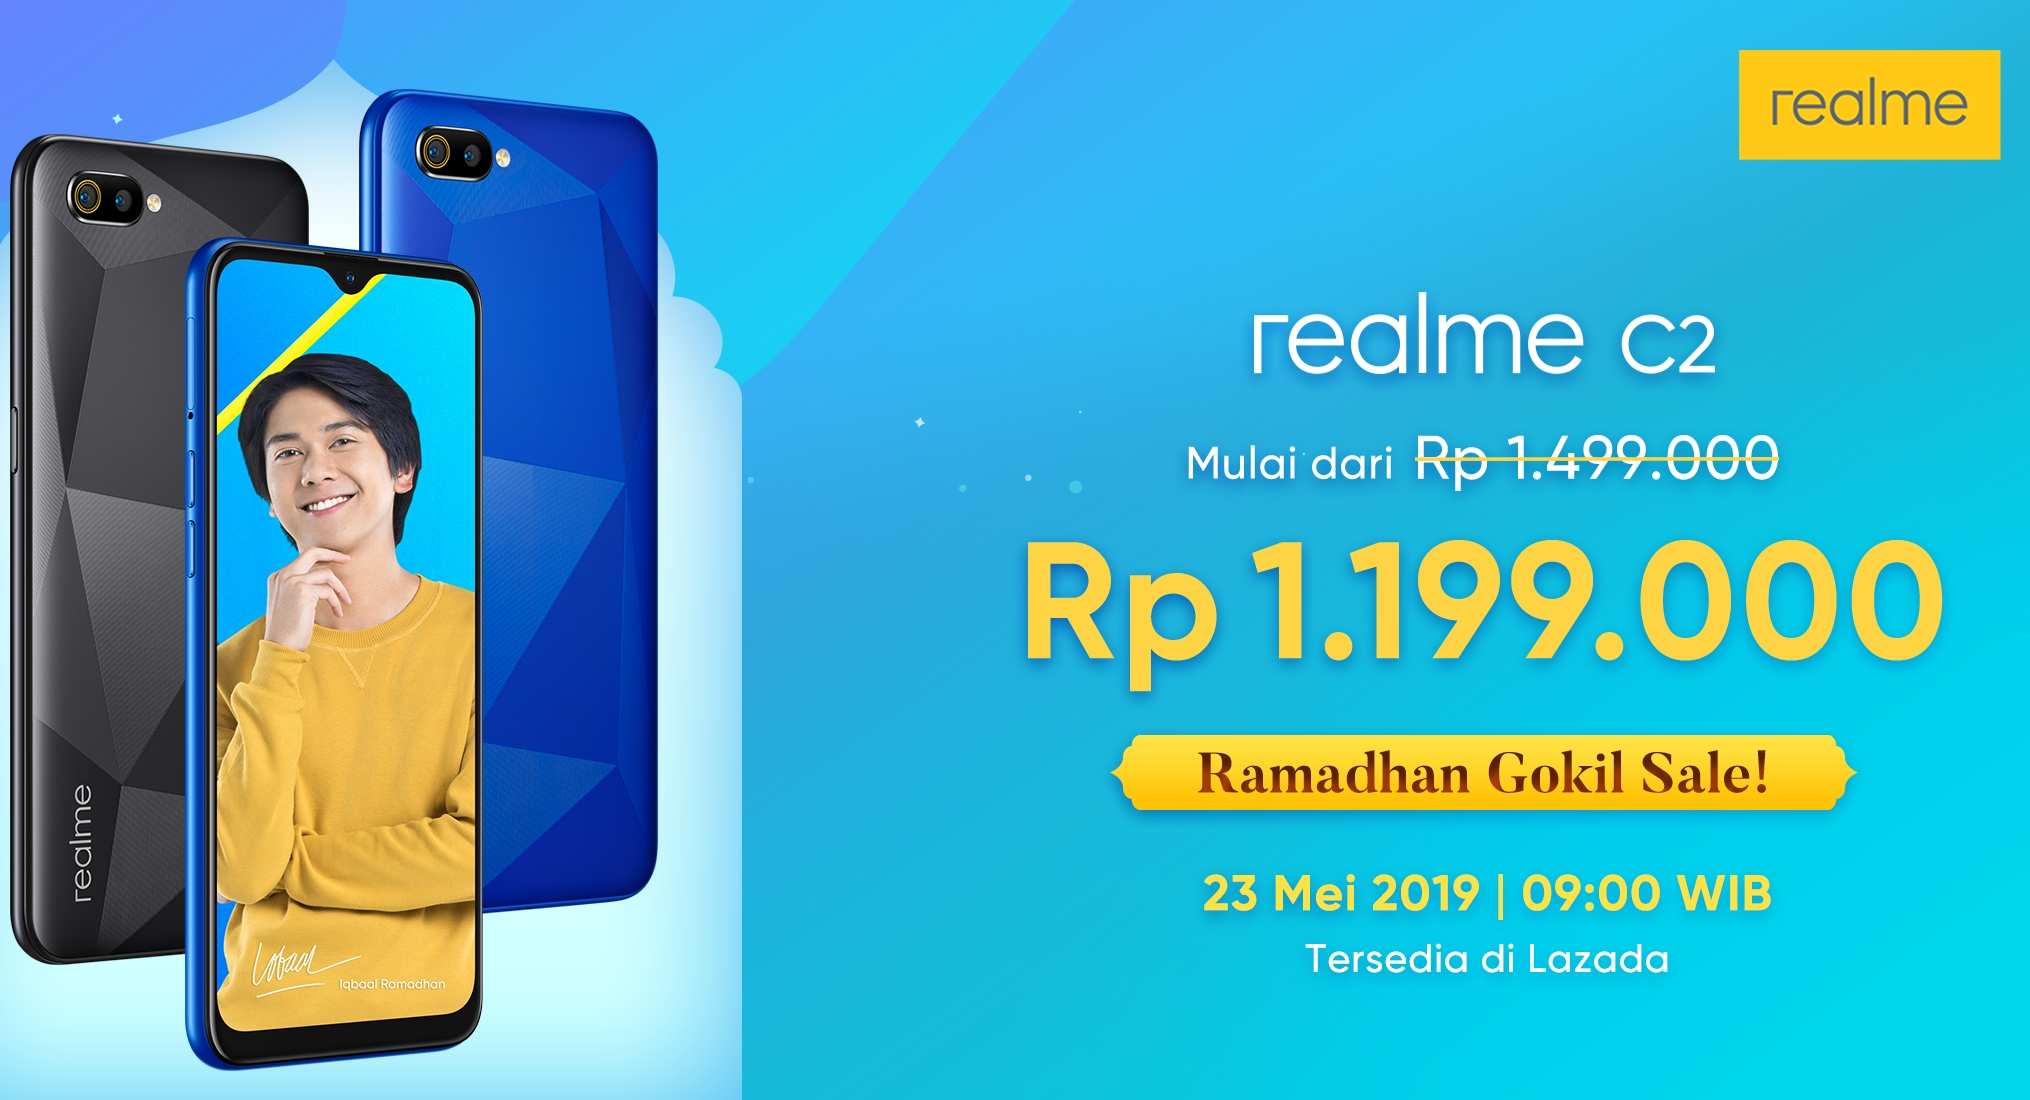 Realme memberikan penawaran khusus yang terbaik di Bulan Ramadan untuk realme C2 melalui program Ramadan Gokil Sale.